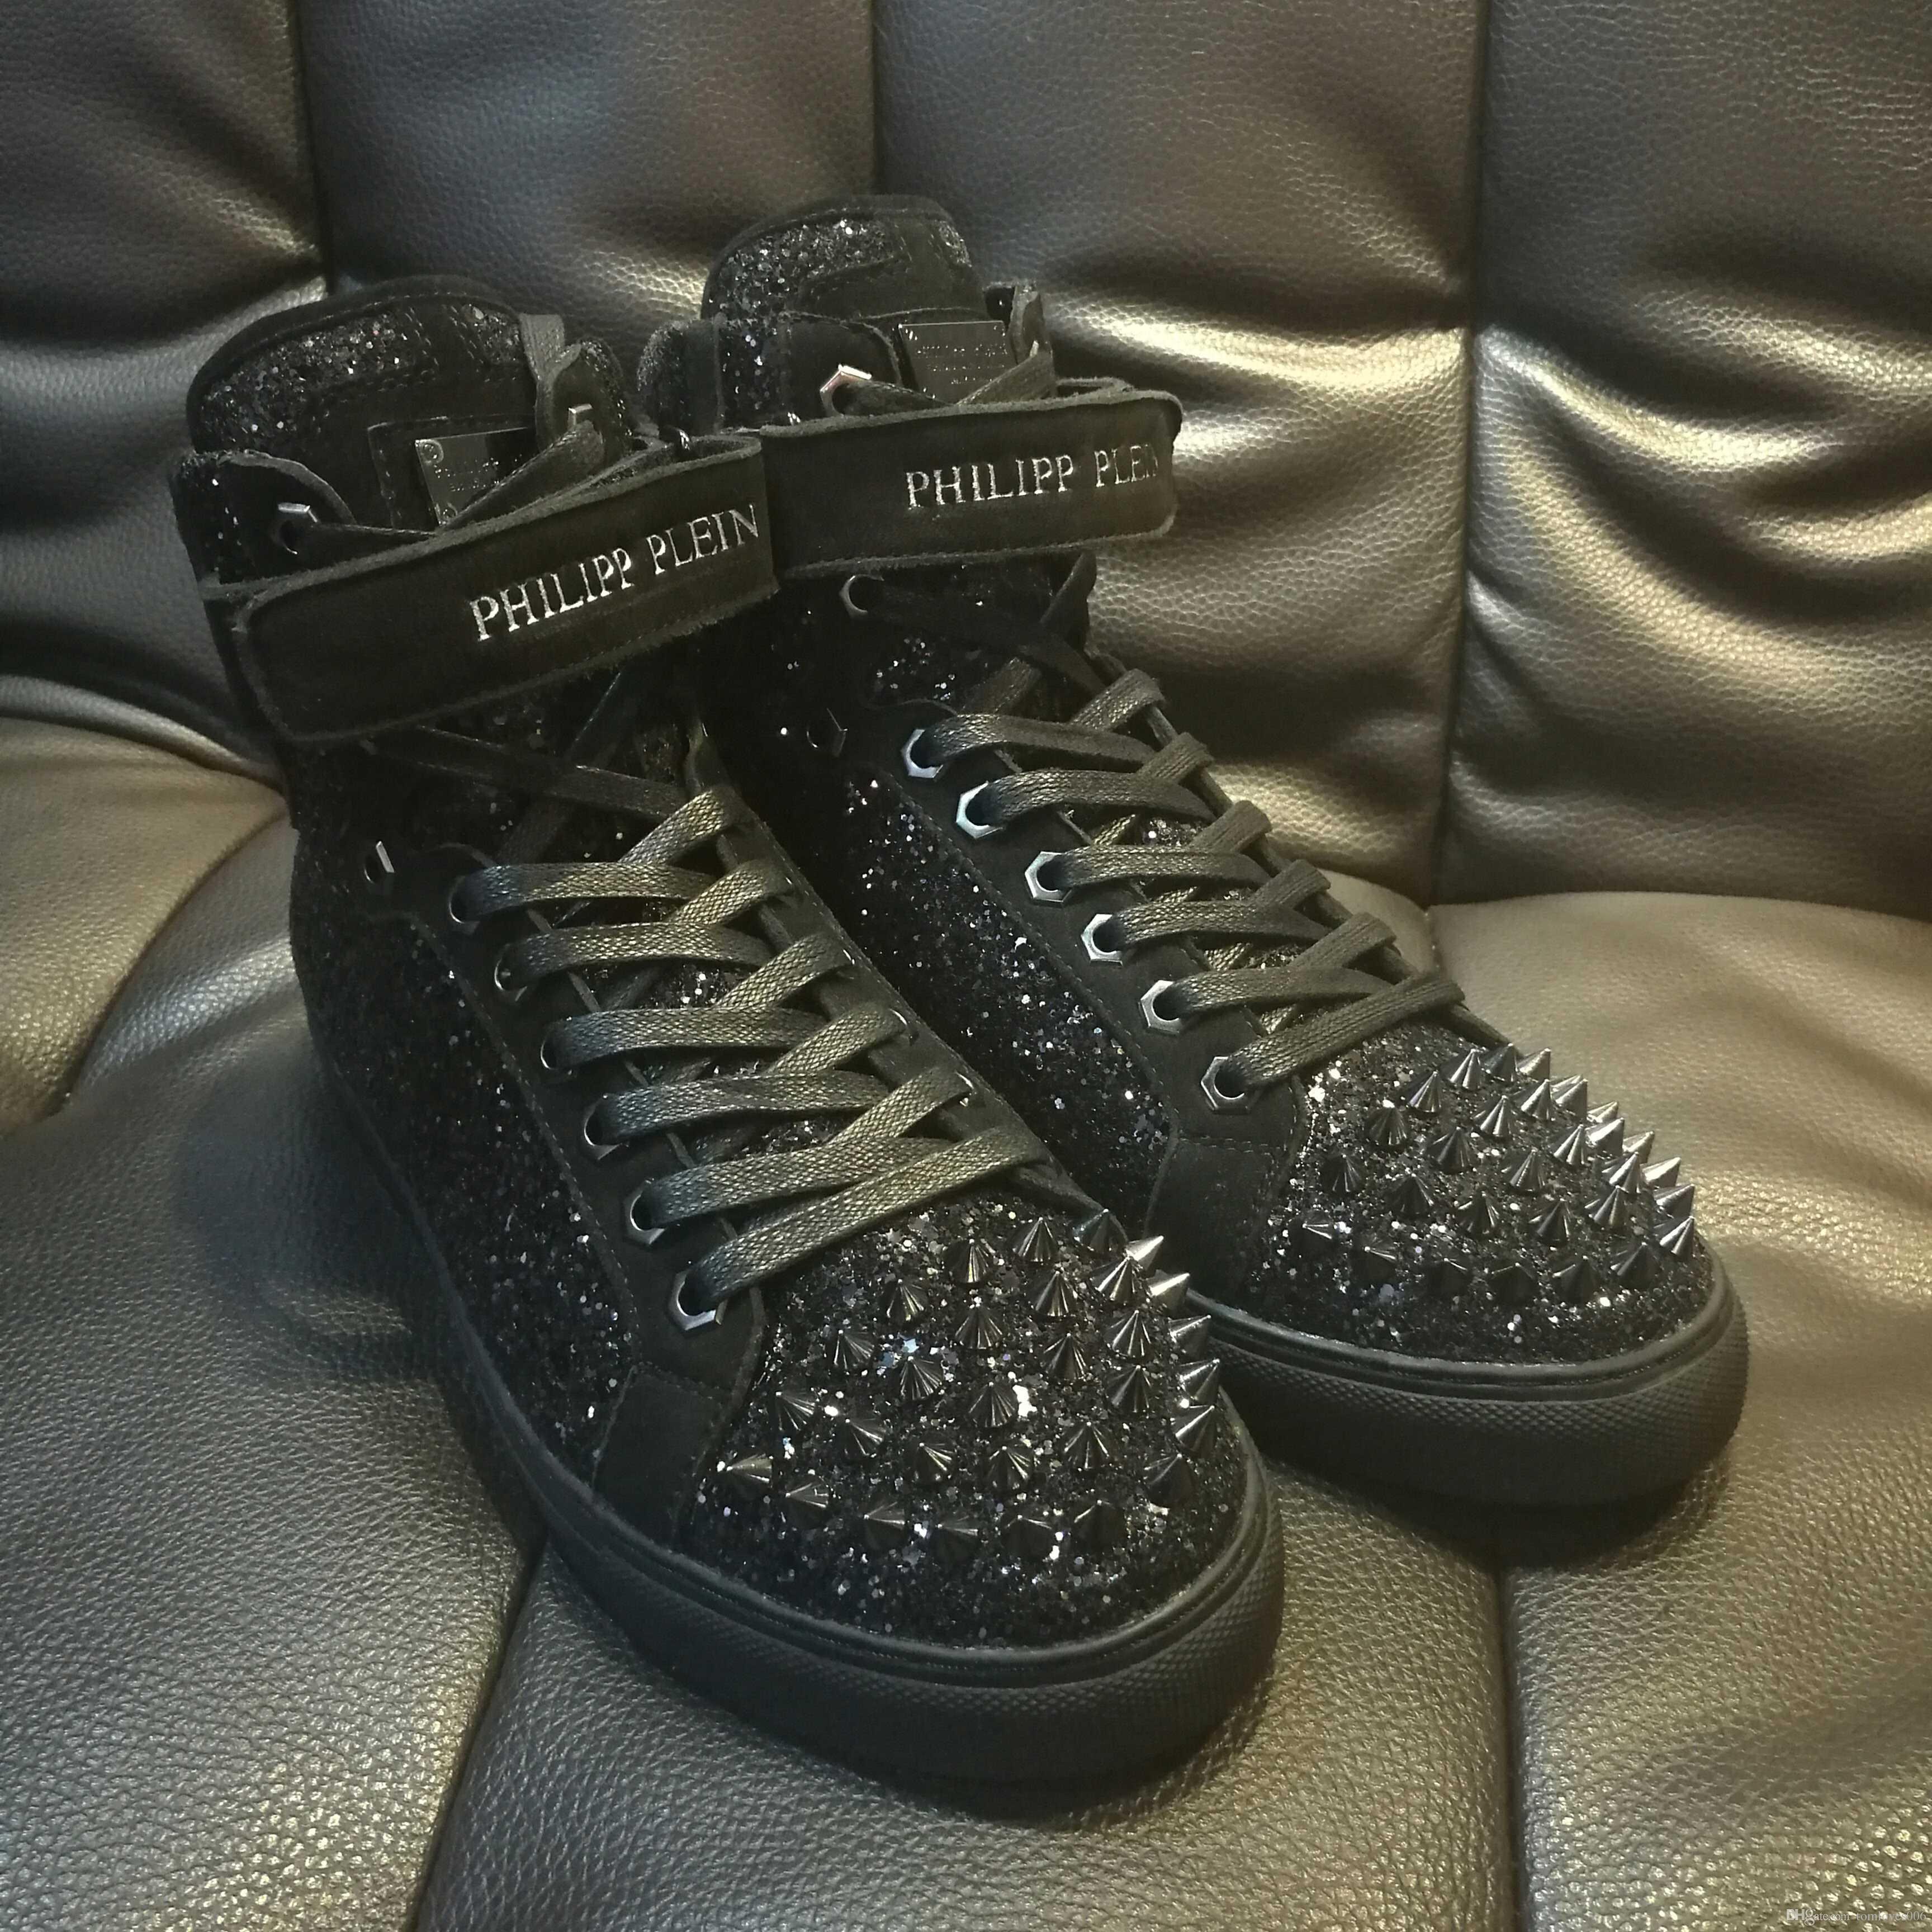 black high top designer sneakers